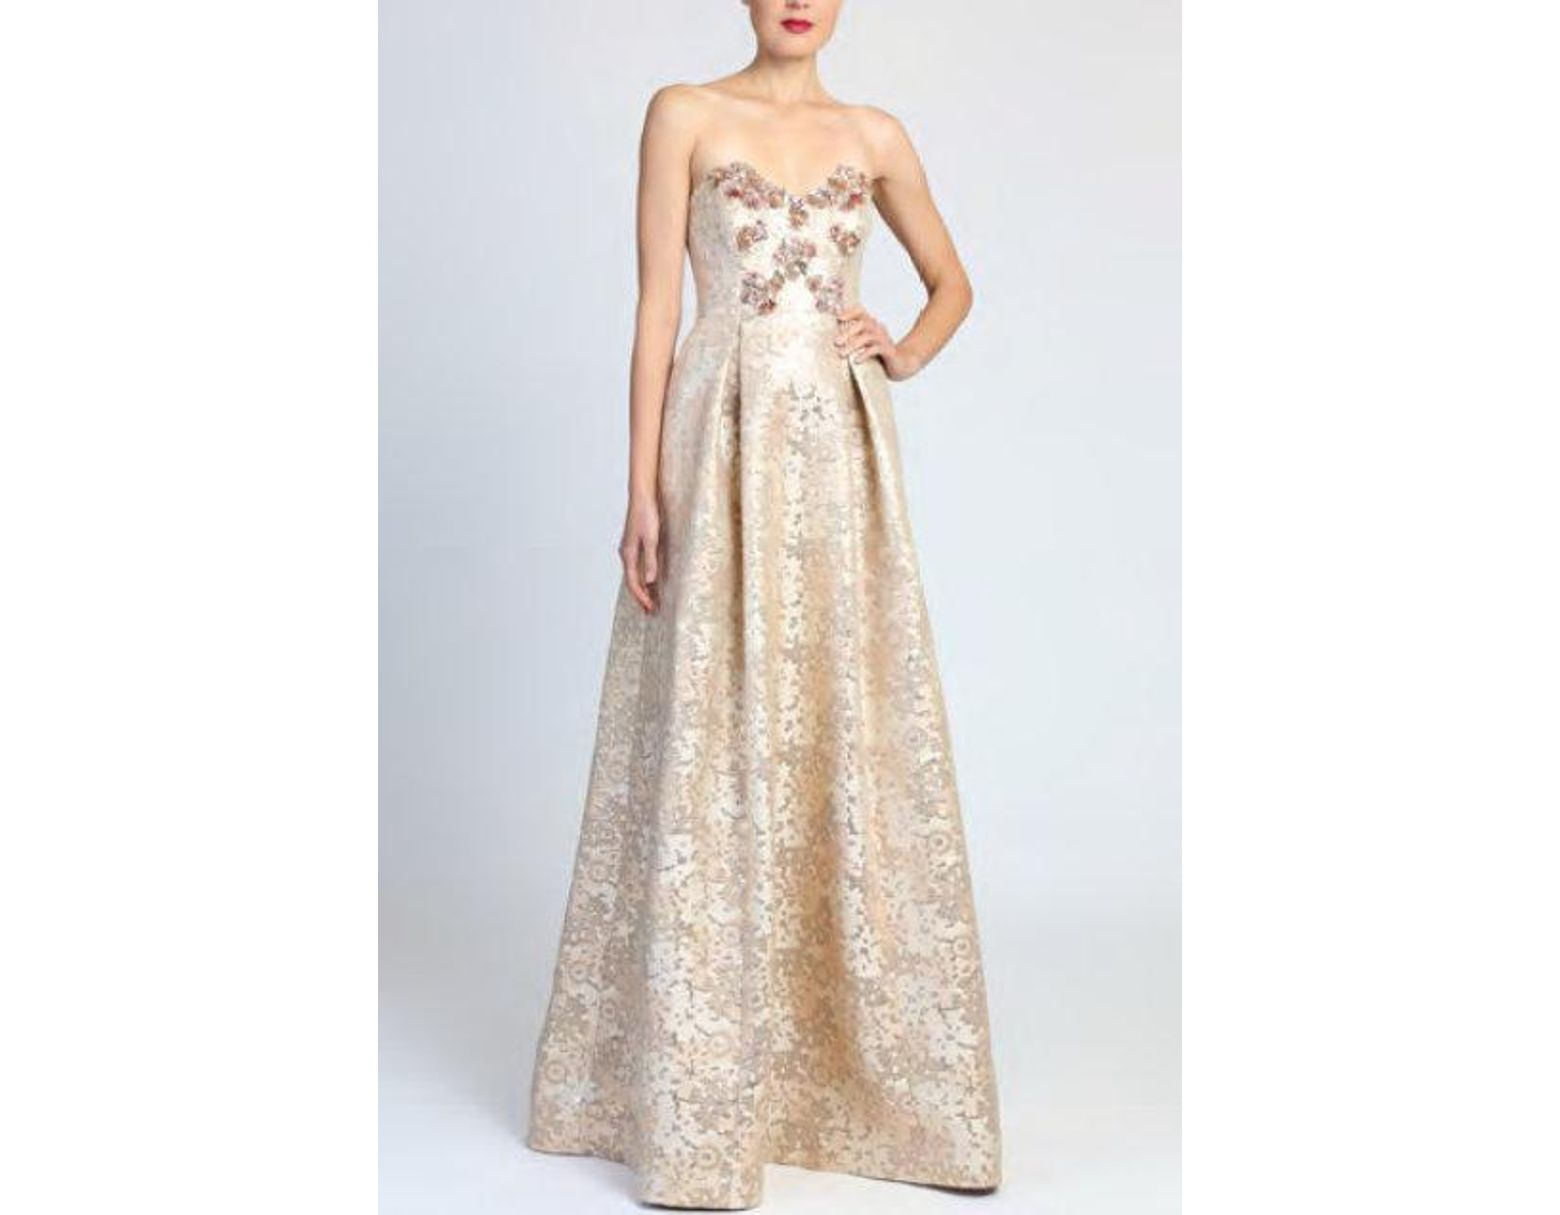 b43135ab6fc Badgley Mischka Rose Gold Strapless Evening Gown in Metallic - Lyst